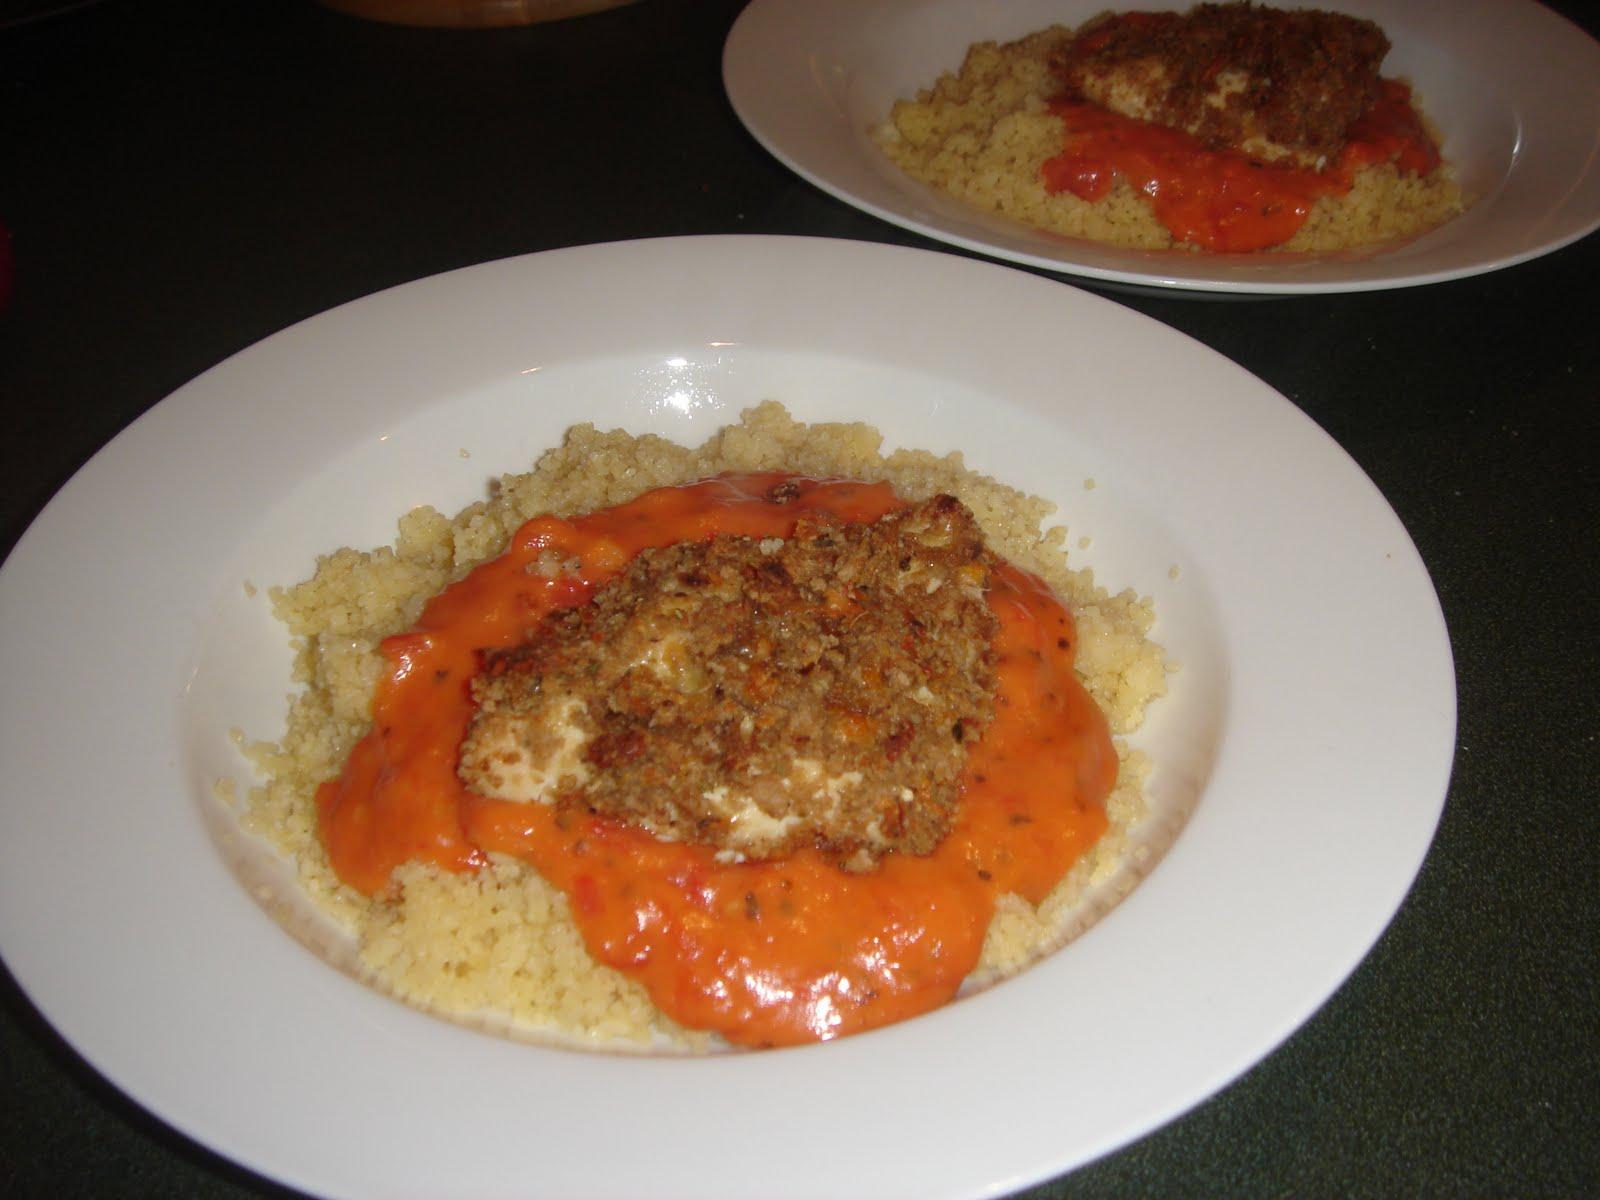 Craving Fresh: What to eat Wednesdays - Parmesan chicken ...